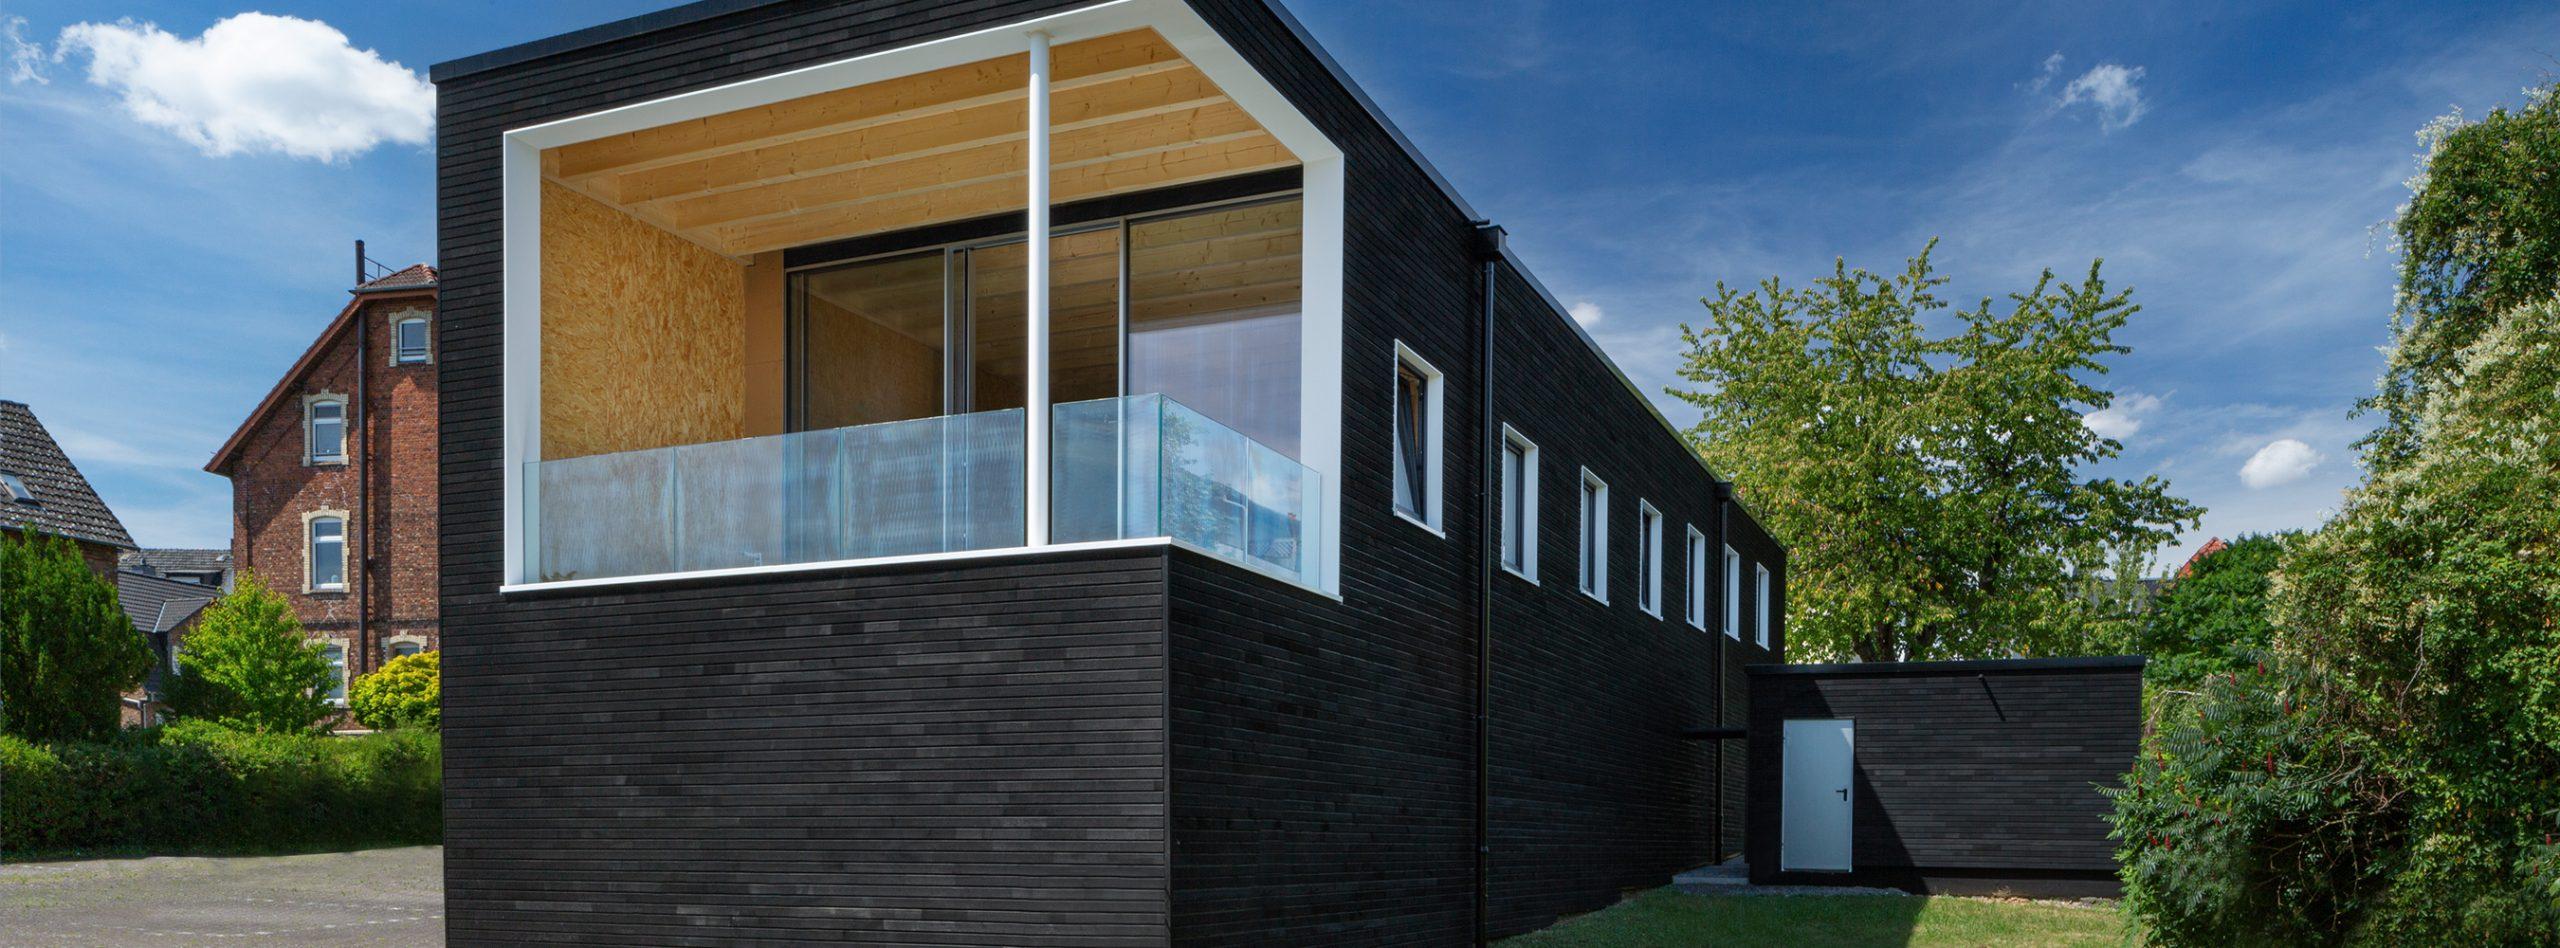 Architektufotografie - Architektenhaus, Wettenberg